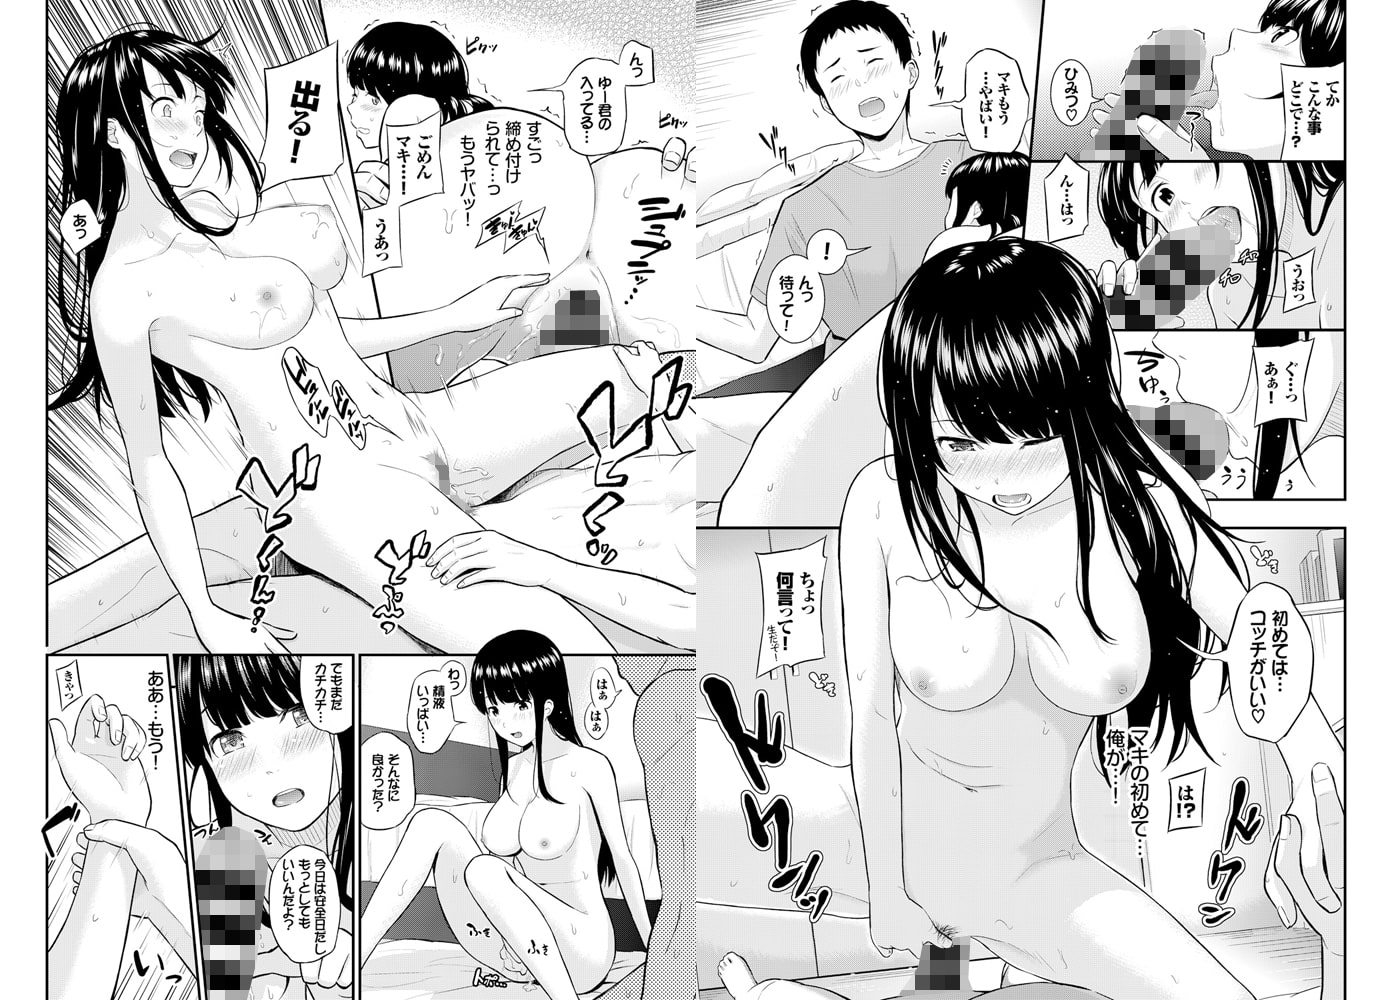 COMIC BAVEL SPECIAL COLLECTION(コミックバベル スペシャルコレクション) VOL16